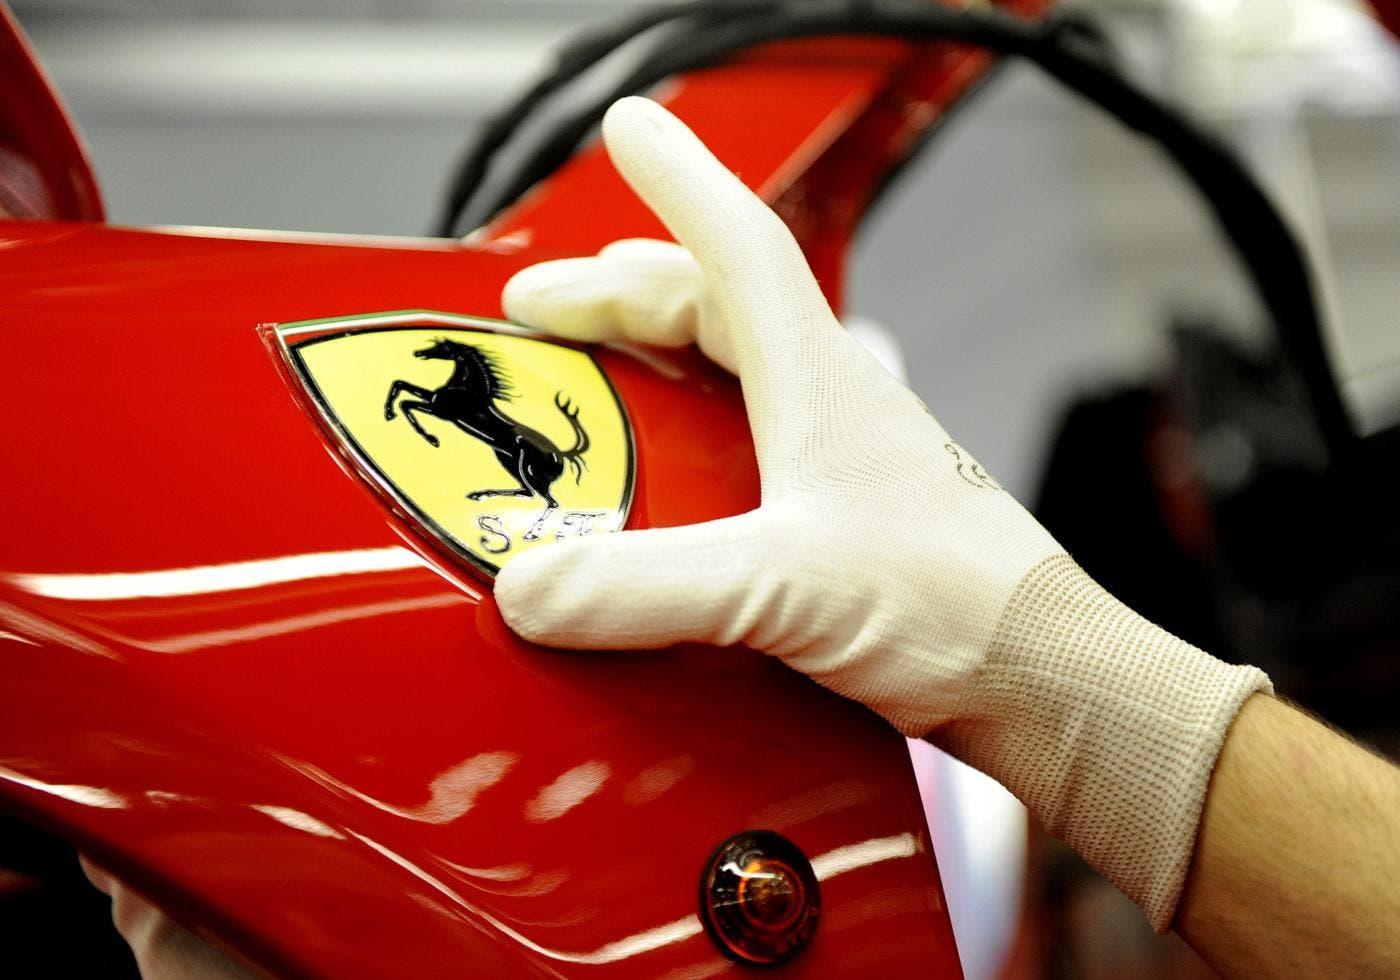 Ferrari processo di verniciatura a bassa temperatura